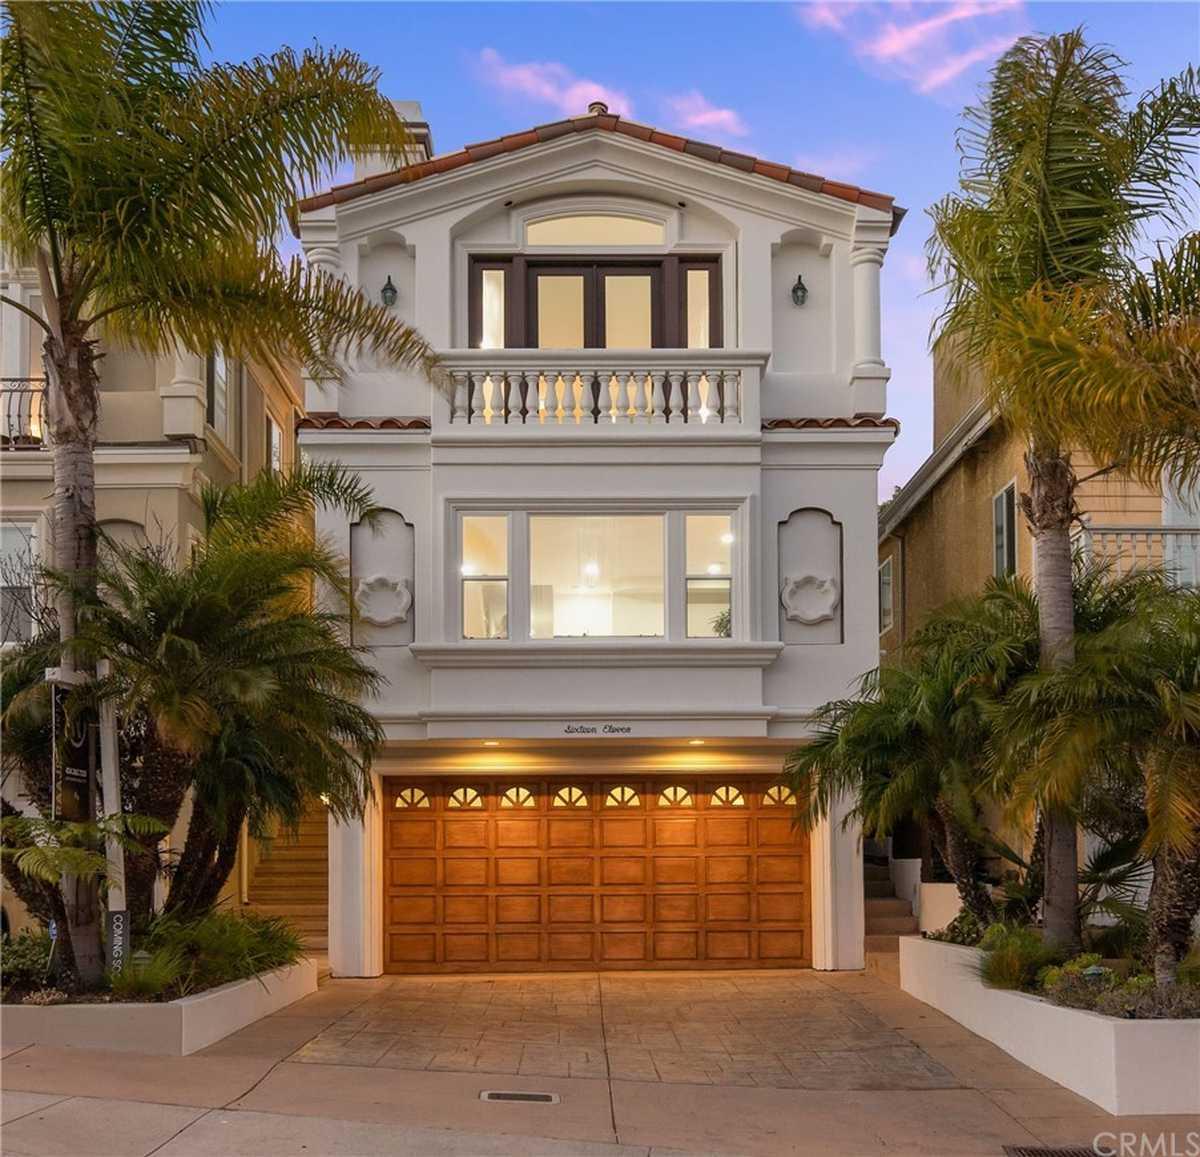 $1,949,000 - 5Br/4Ba -  for Sale in Redondo Beach